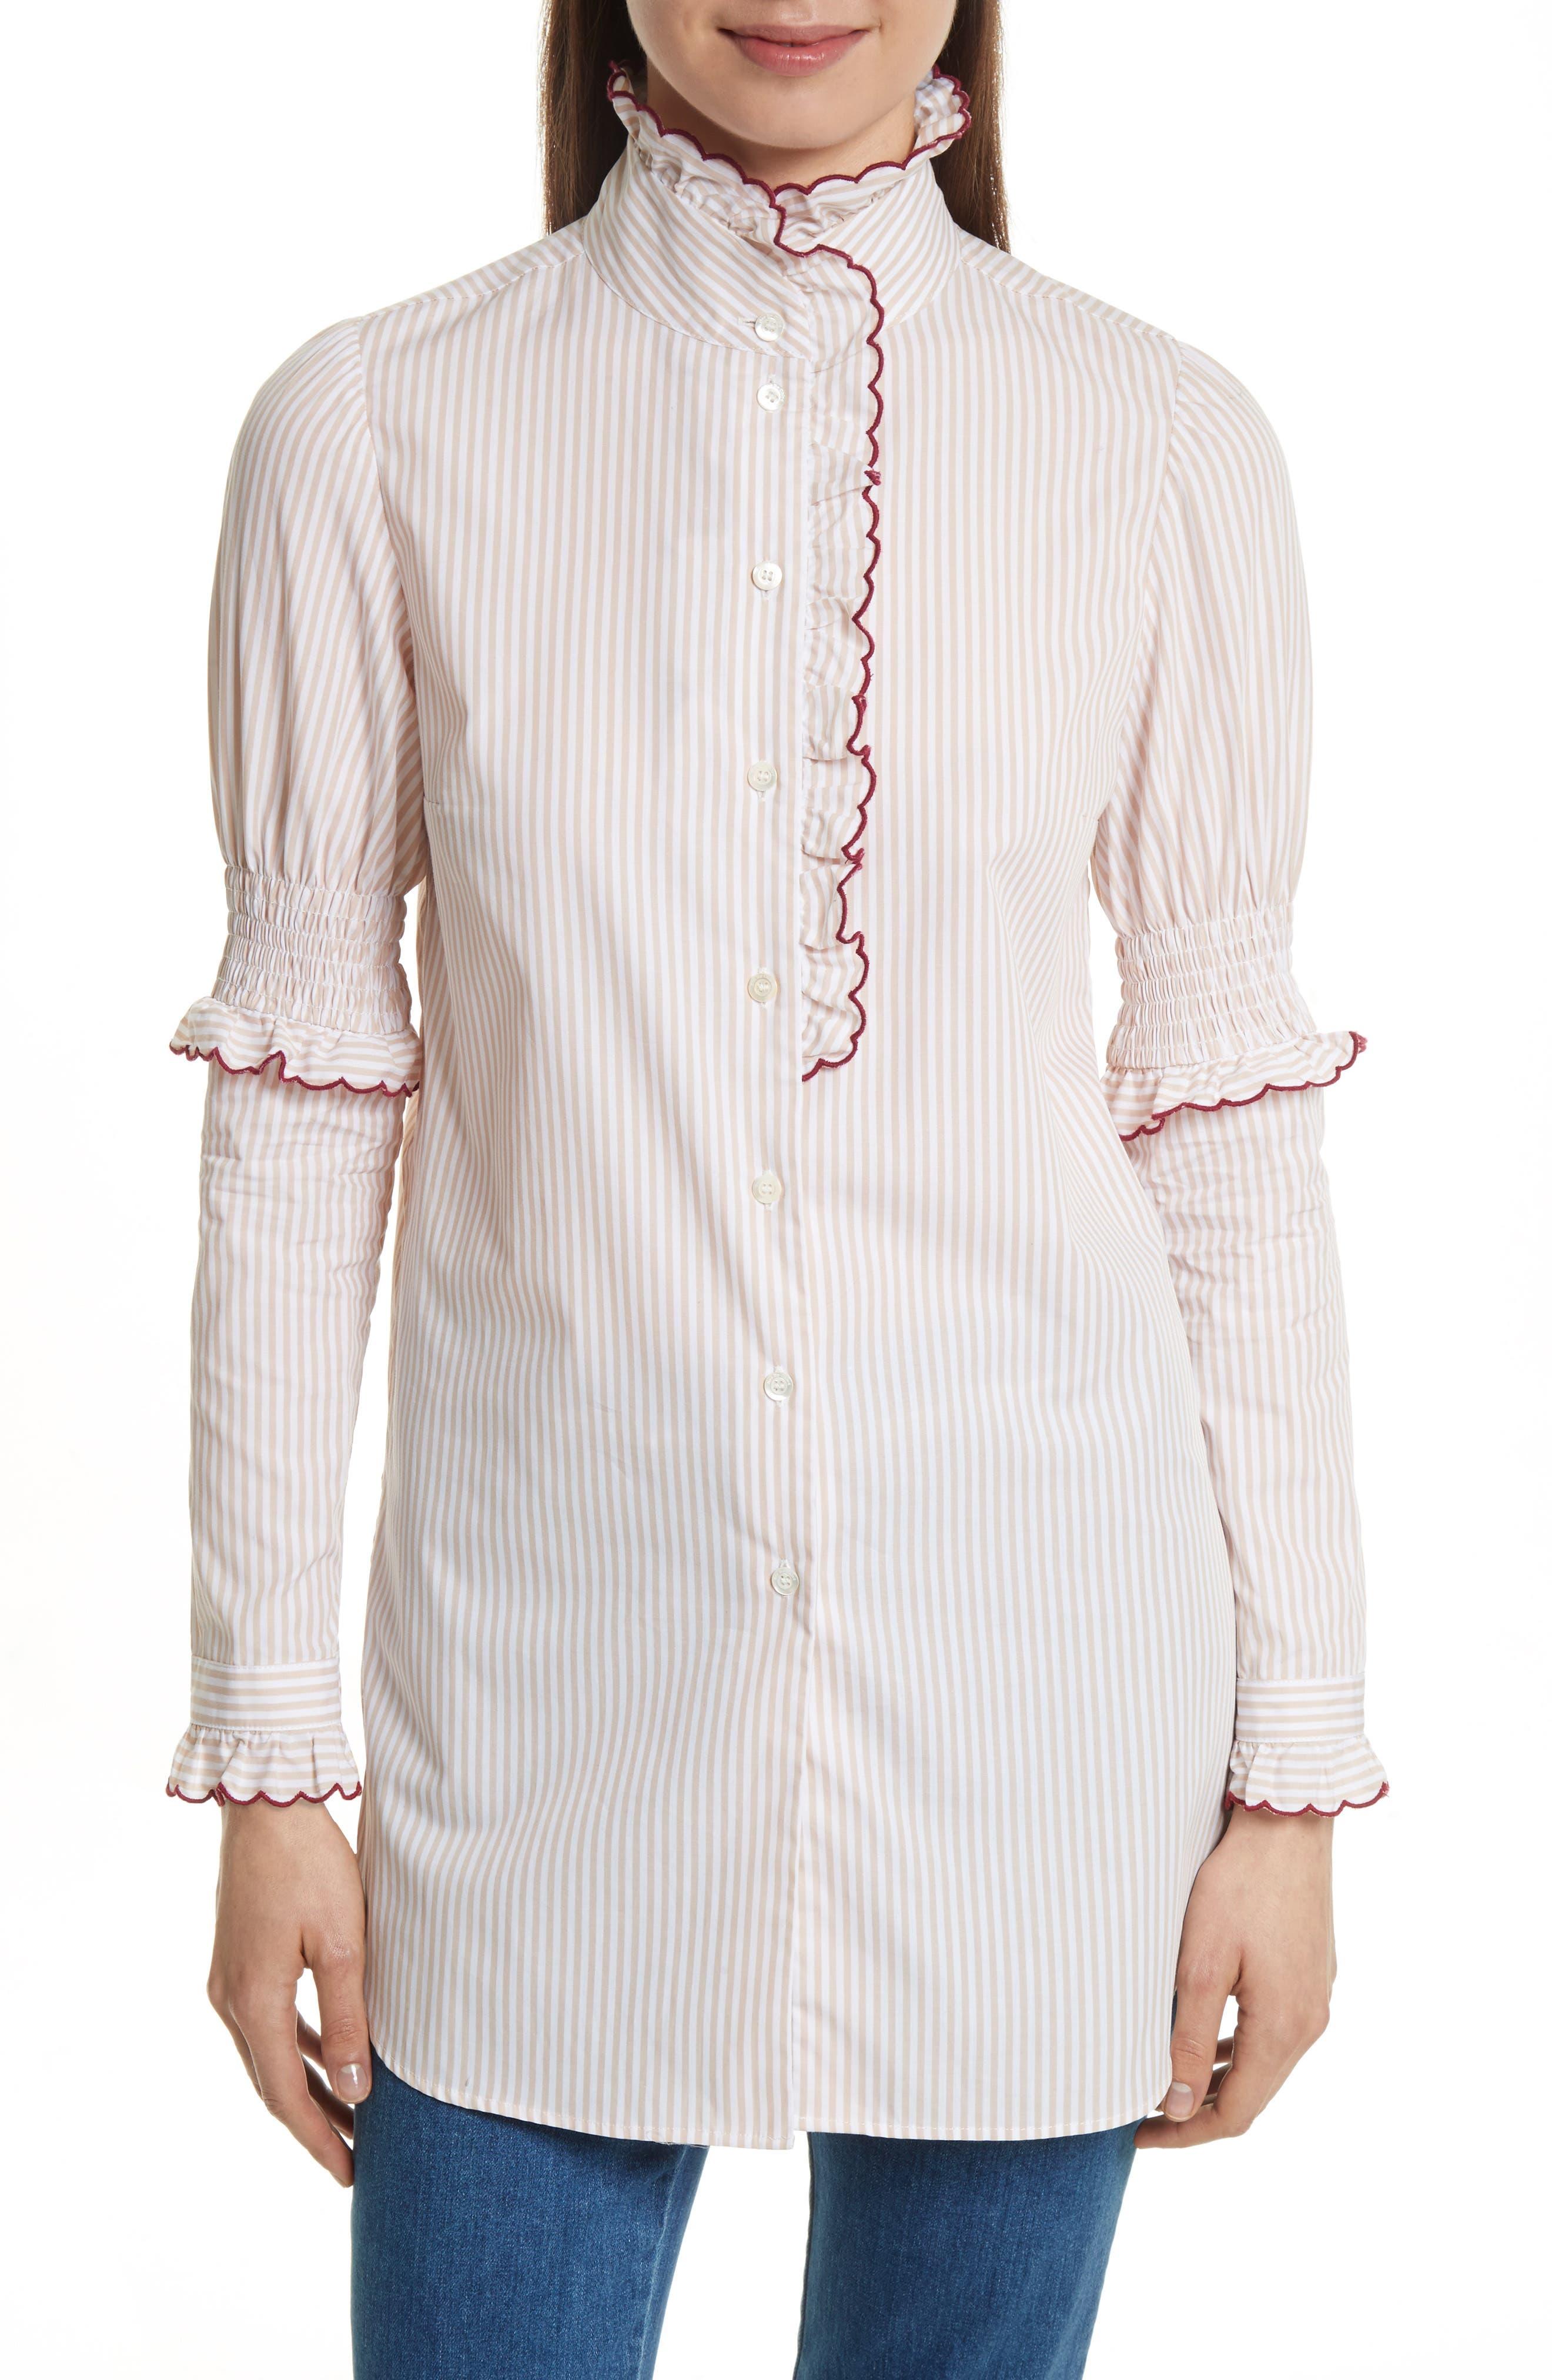 Stripe Cotton Shirt,                             Main thumbnail 1, color,                             250